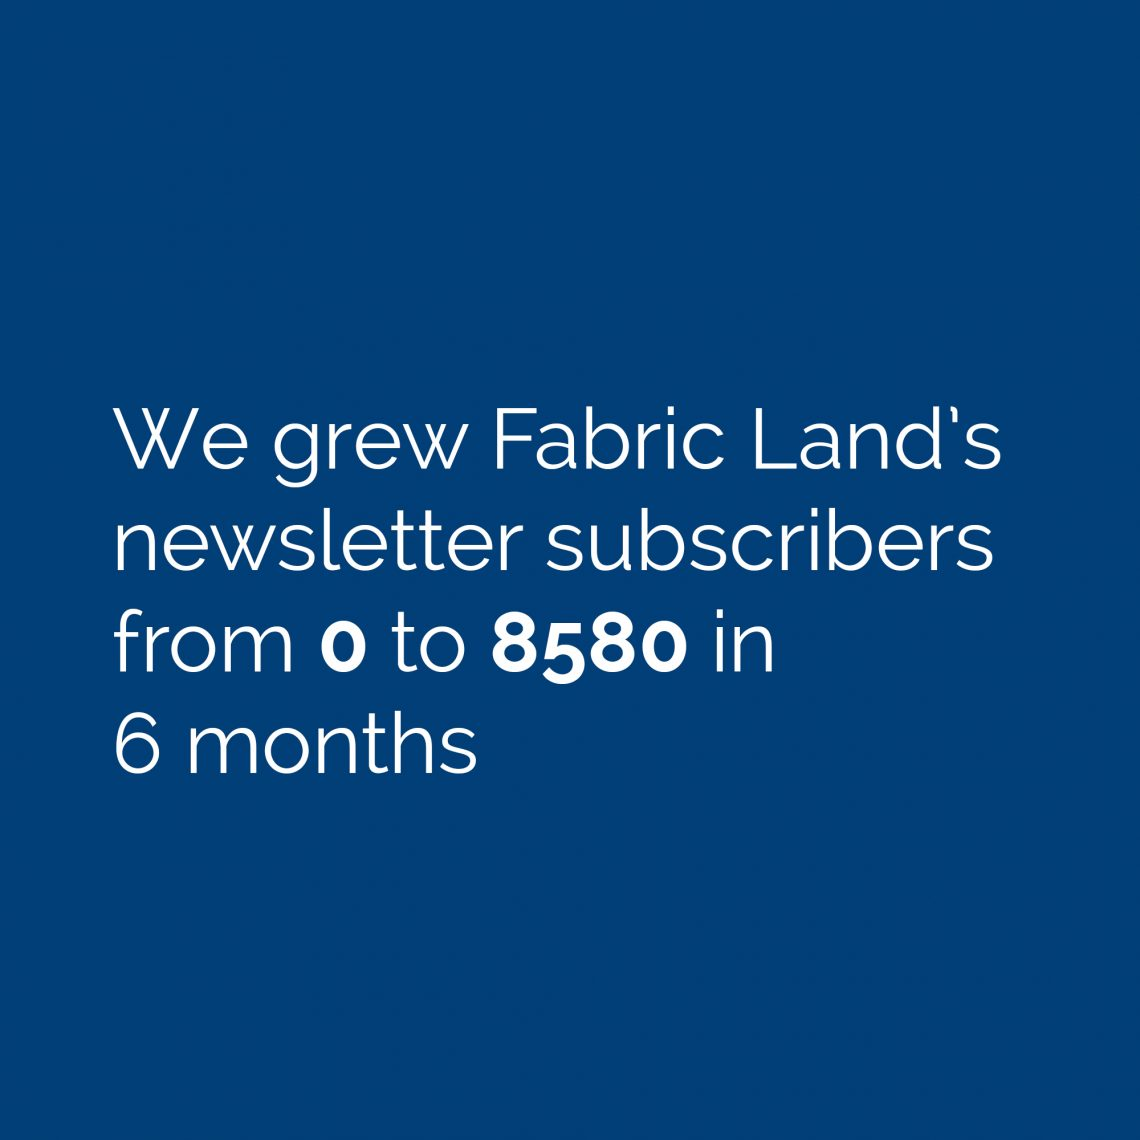 Fabric Land Email Marketing